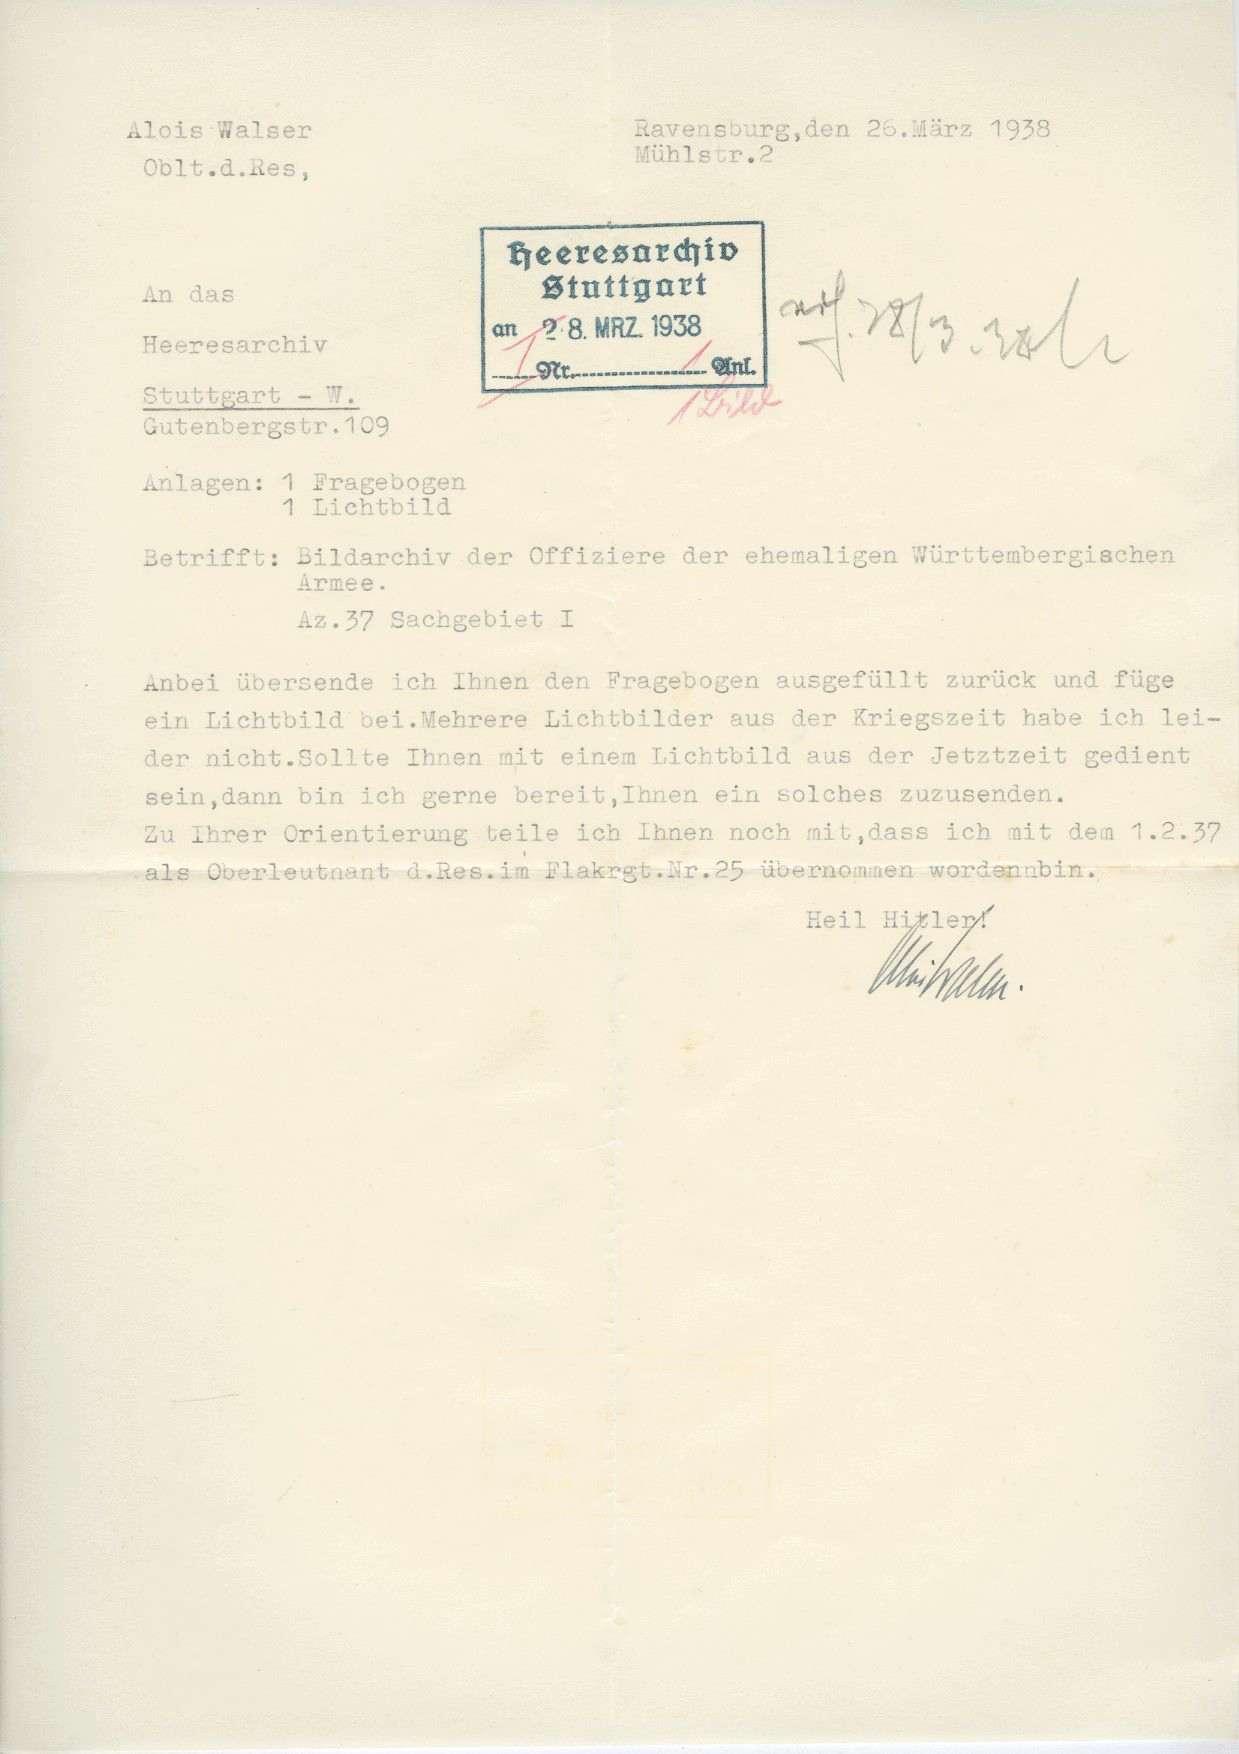 Walser, Alois, Bild 3